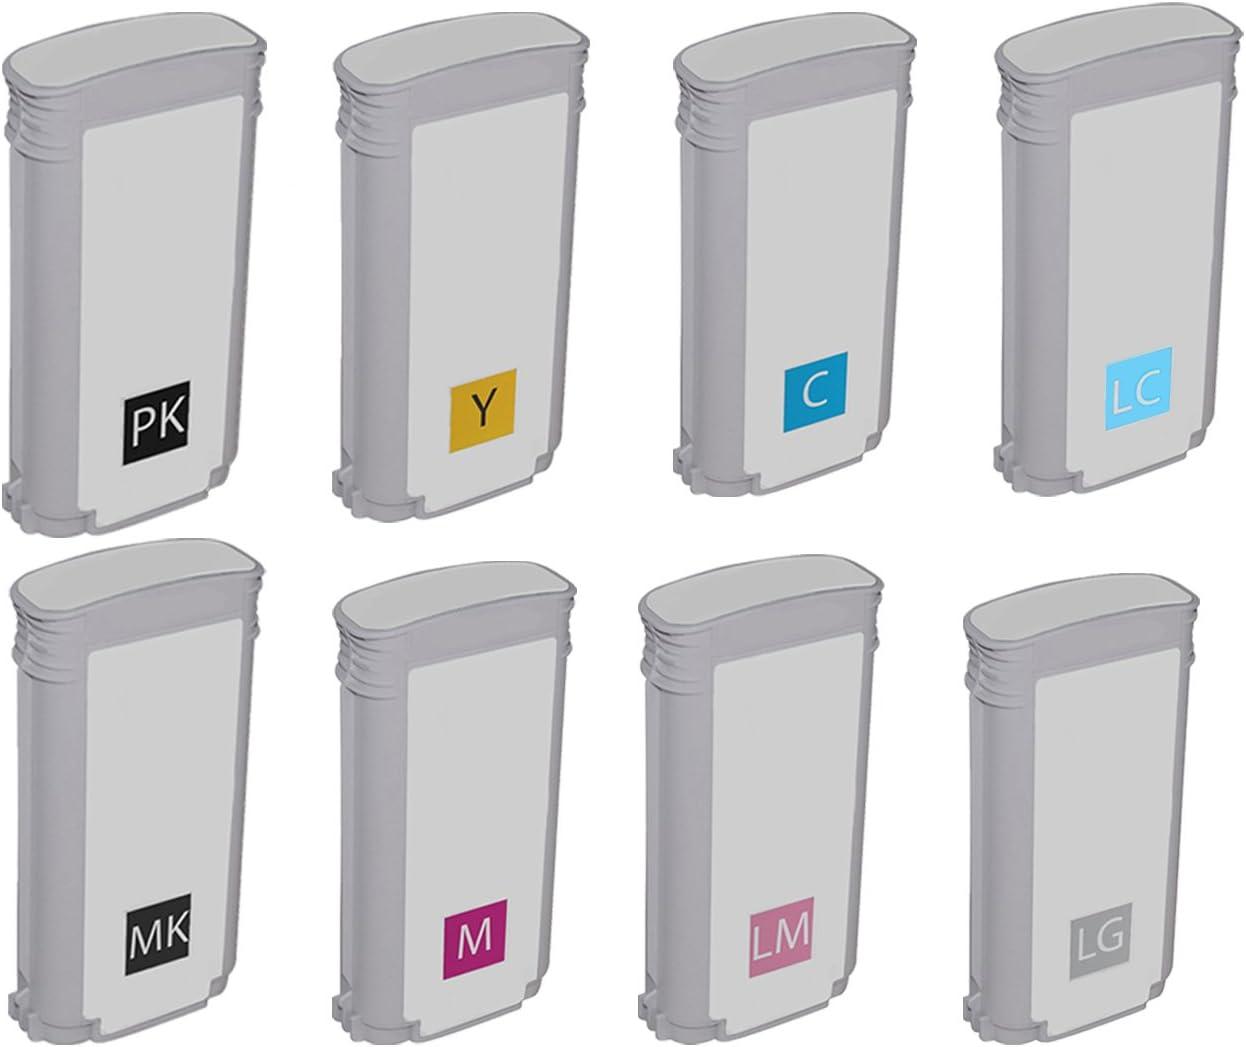 Awesometoner Compatible Ink Cartridge Replacement for HP 70 C9448A C9449A C9451A C9452A C9453A C9454A C9390A C9455A use with DesignJet Z2100 MBK, PBK, LGY, C, M, Y, LC, LM, 8-Pack